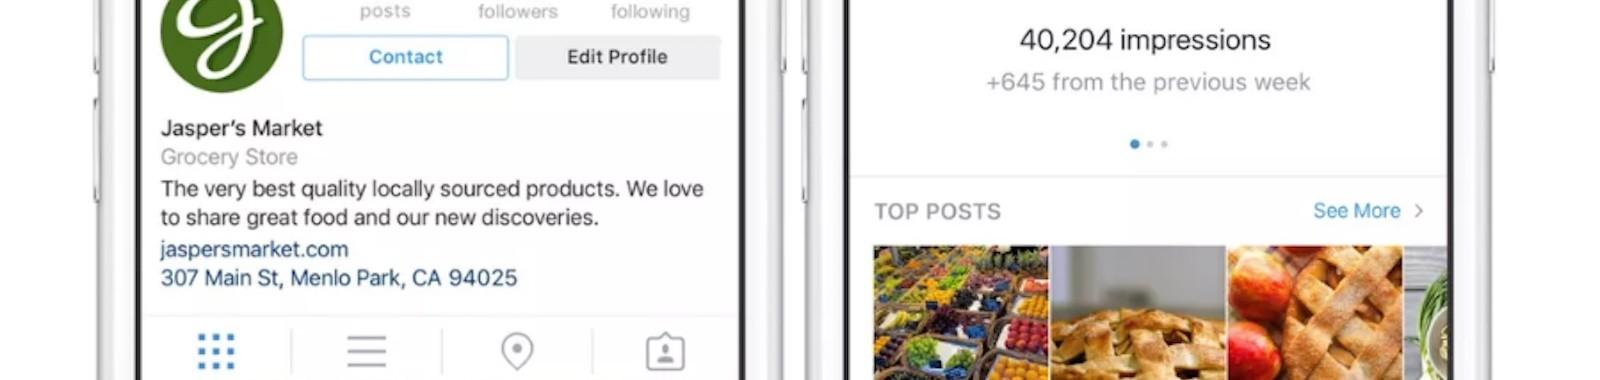 instagram-business-banner-1600x380